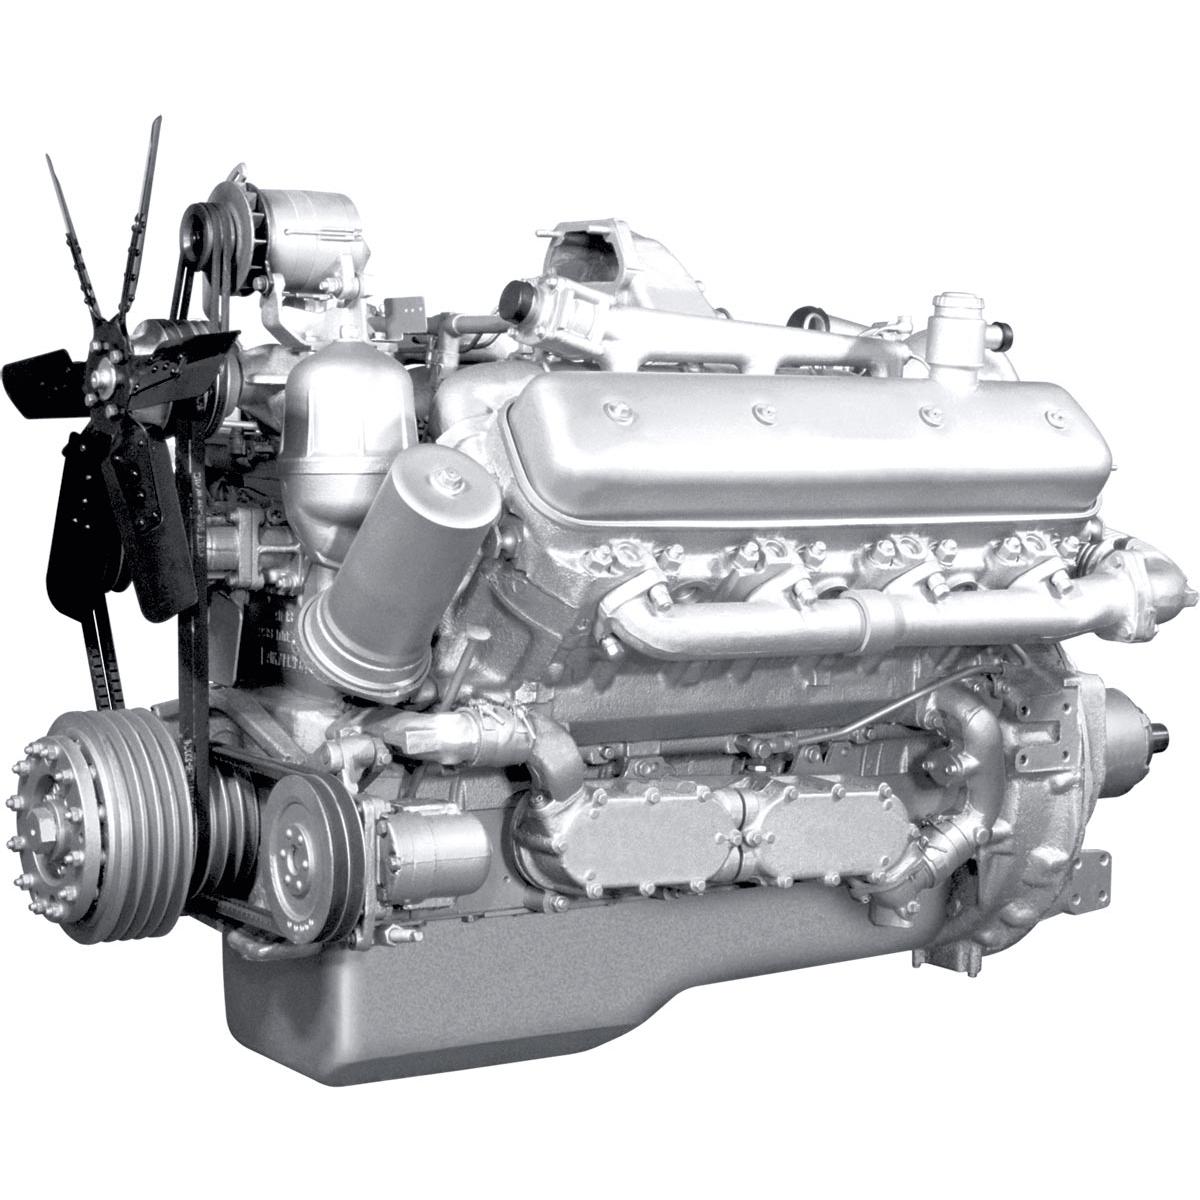 Двигатель ЯМЗ-238Д V8 с турбонаддувом-min